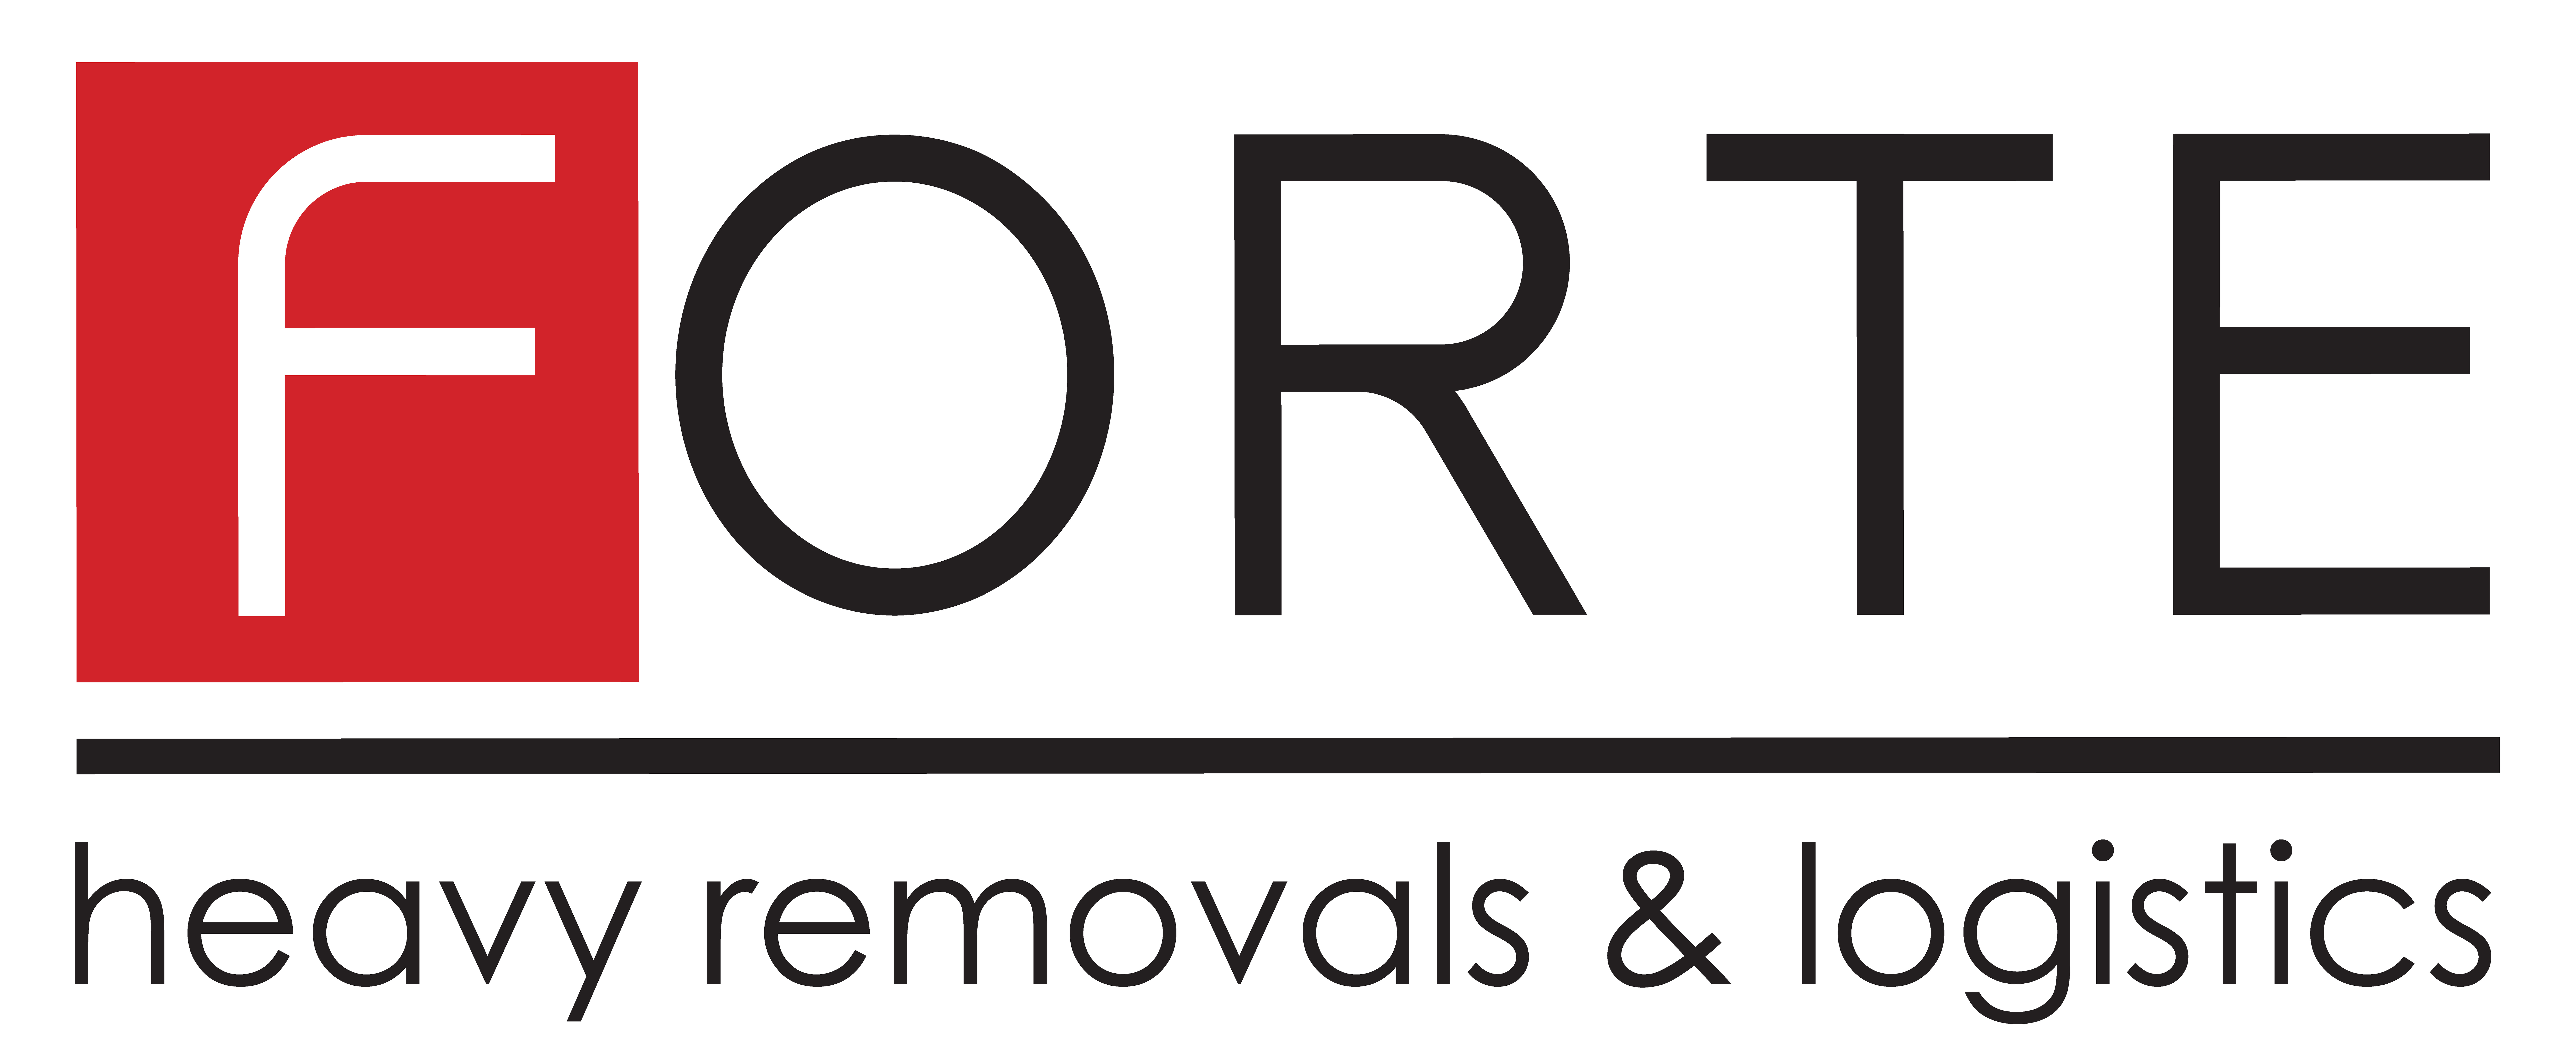 Forte Heavy Removals & Logistics Logo